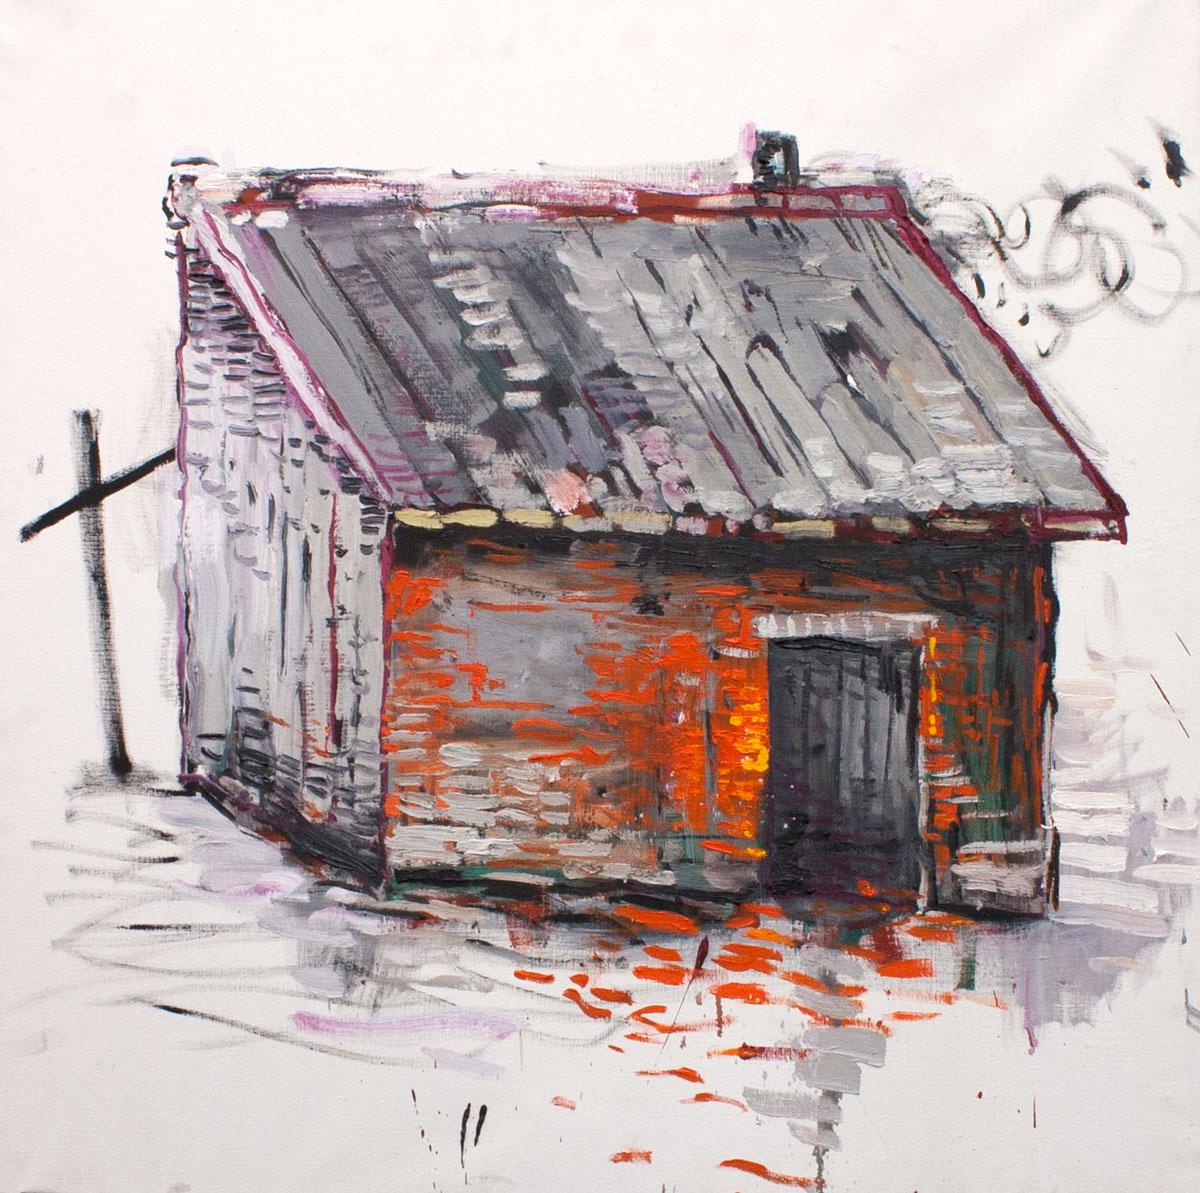 Abraham Lacalle. CABAÑA, 2016. Óleo sobre lienzo. 95.5 x 95.5 cm